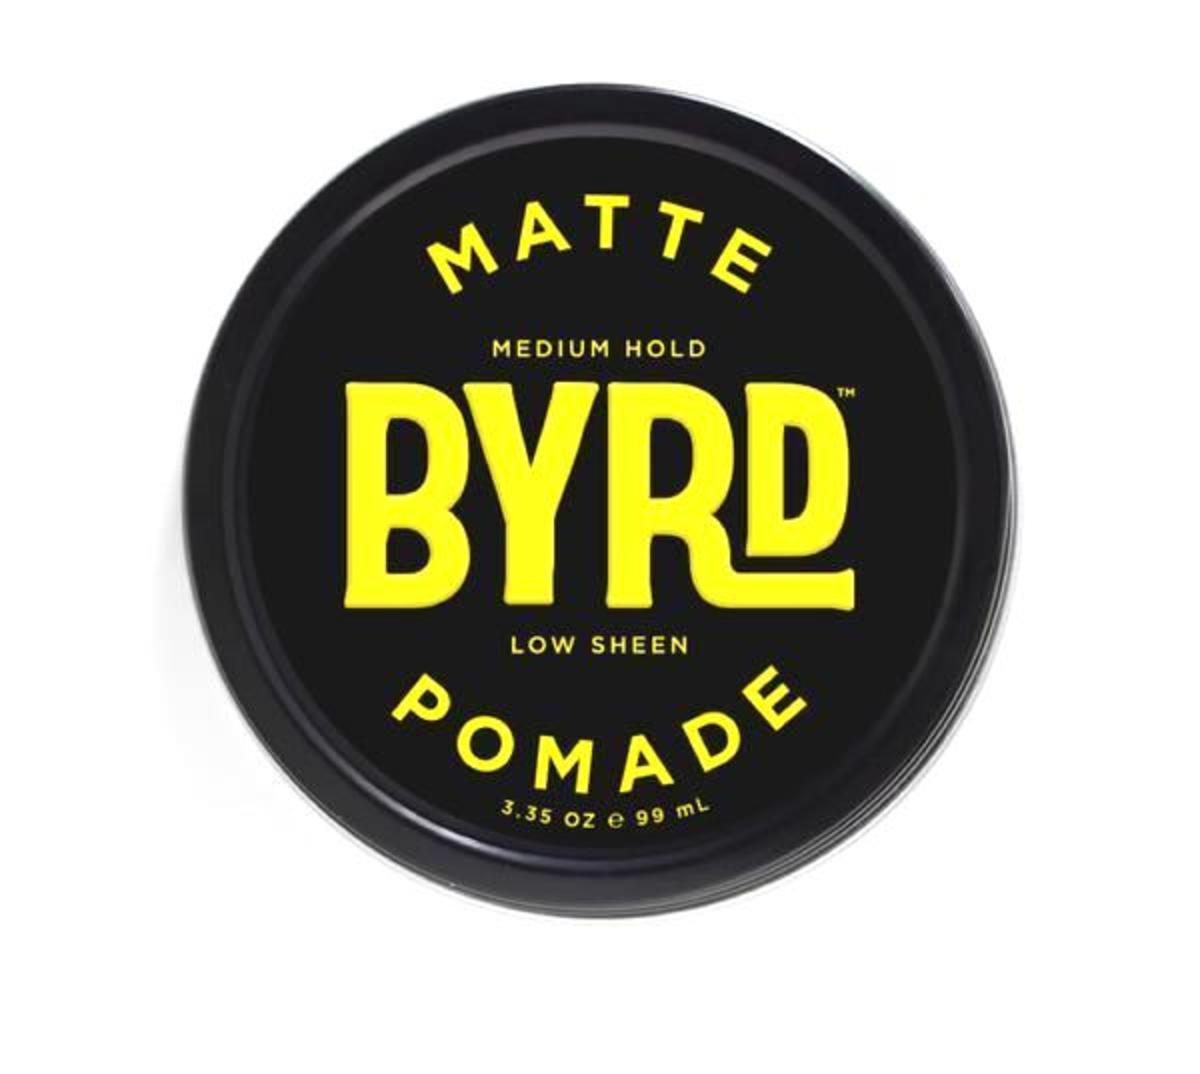 byrd_matte_pomade_3_1024x1024_e6994e53-a1fc-4910-a1a4-fa7b2b22f723_grande